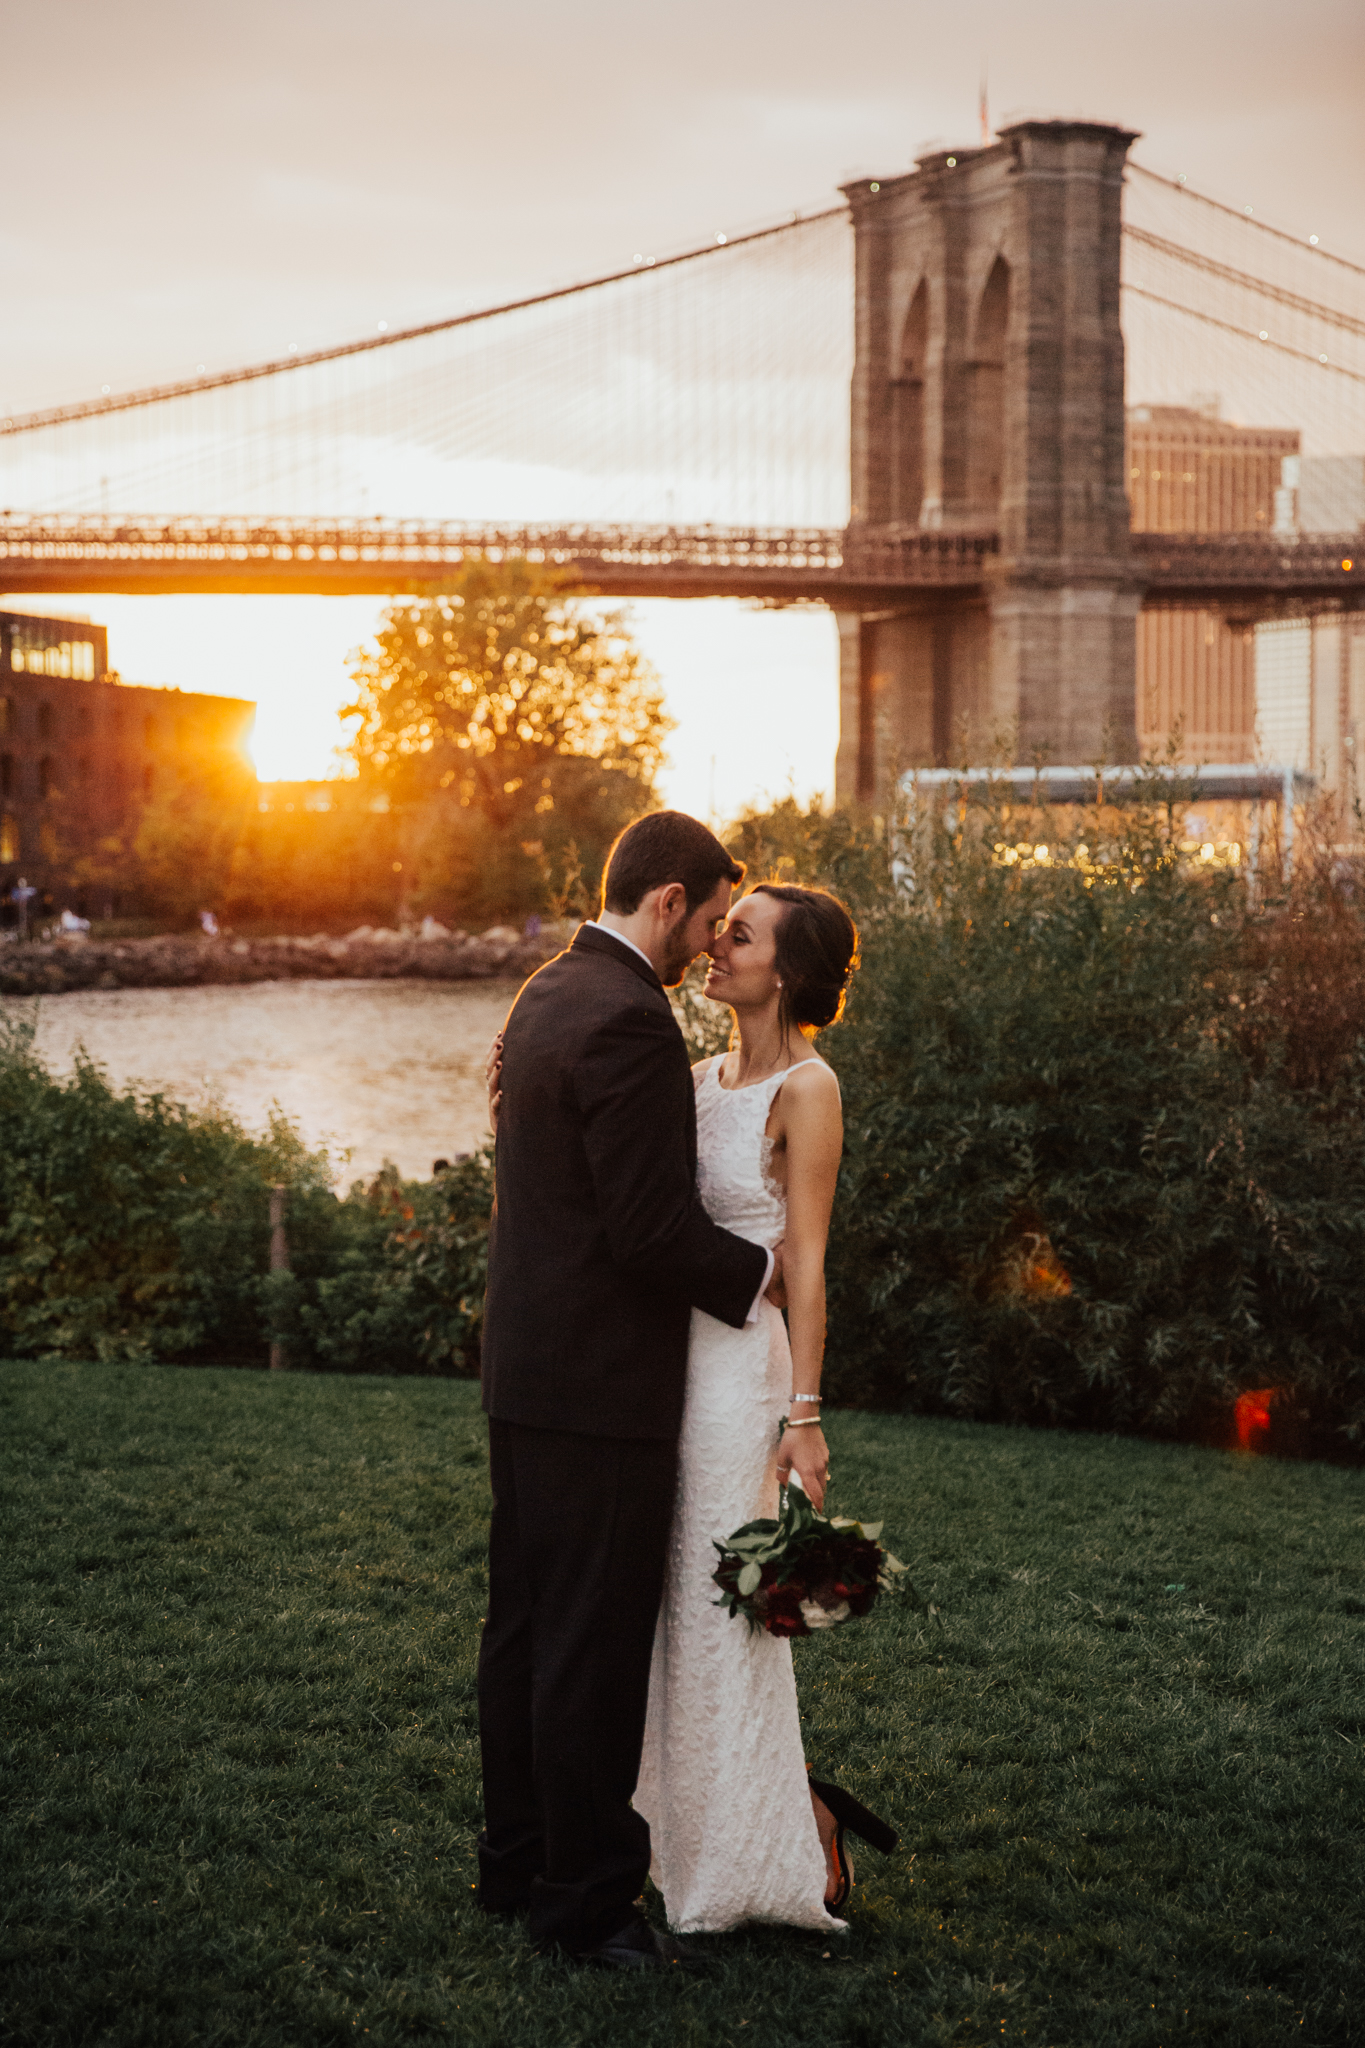 26-bridge-wedding-brooklyn-068.JPG